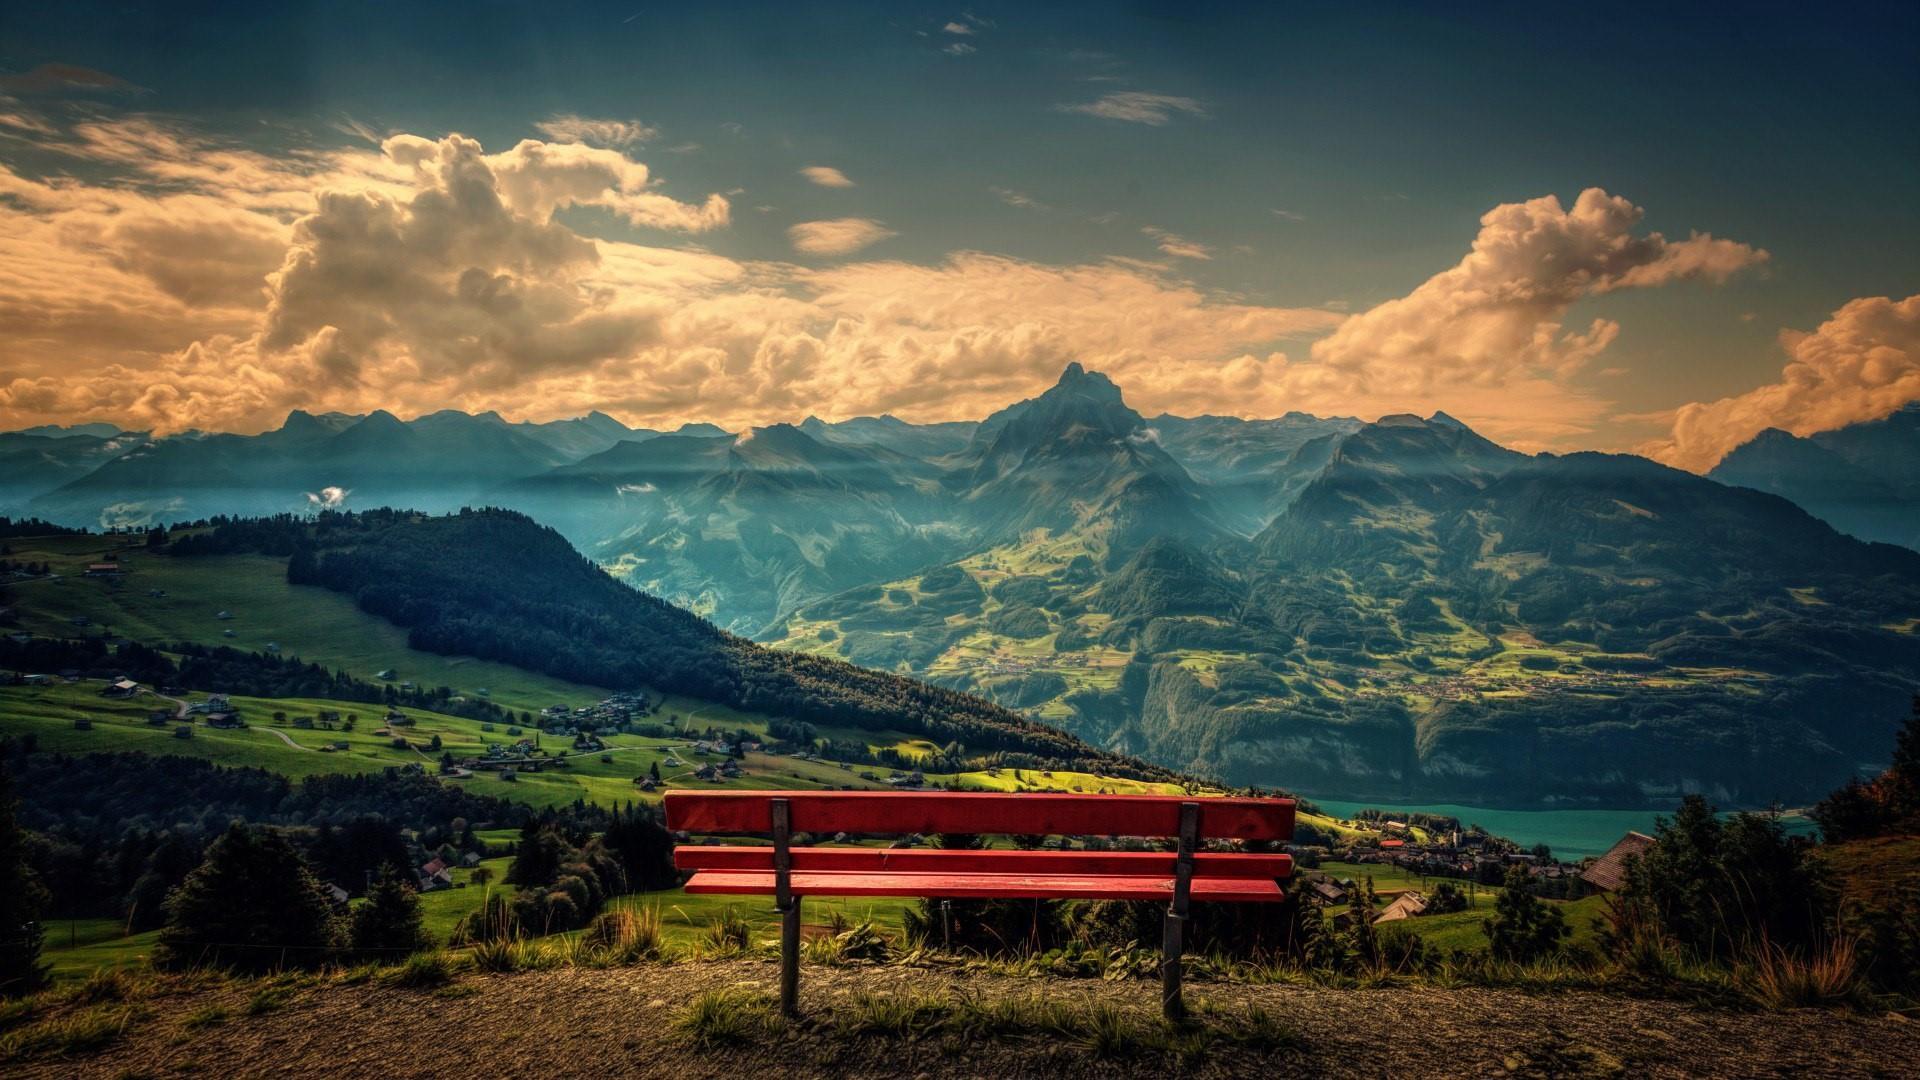 Mountain top scenery wallpaper